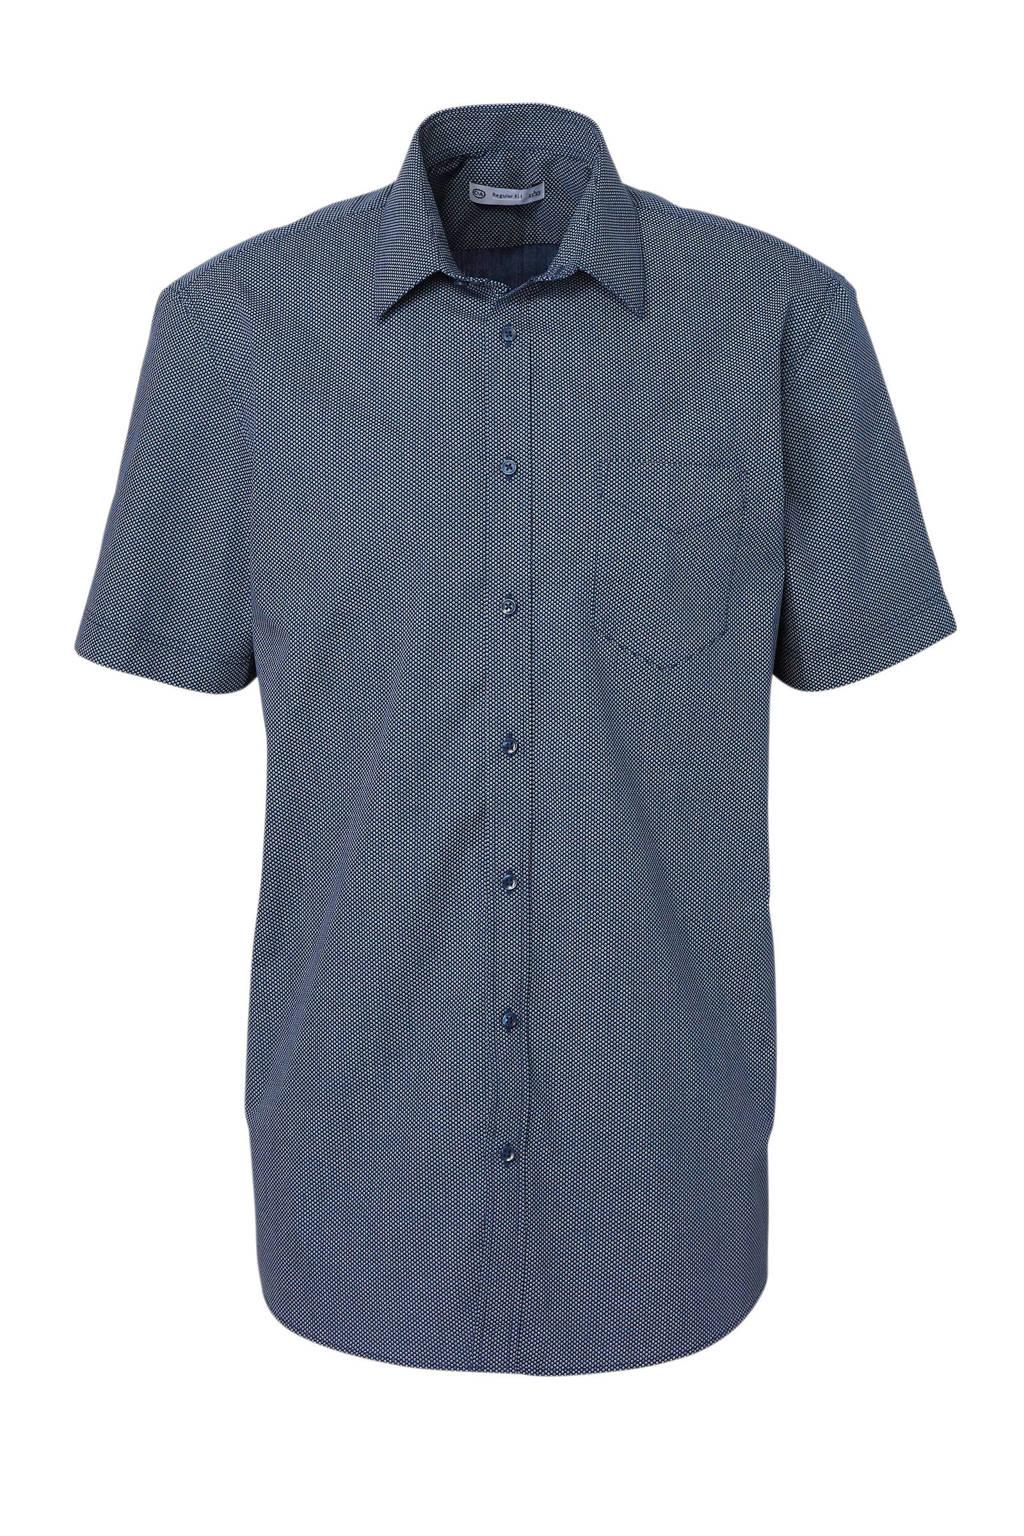 C&A Angelo Litrico regular fit overhemd met print, Donkerblauw